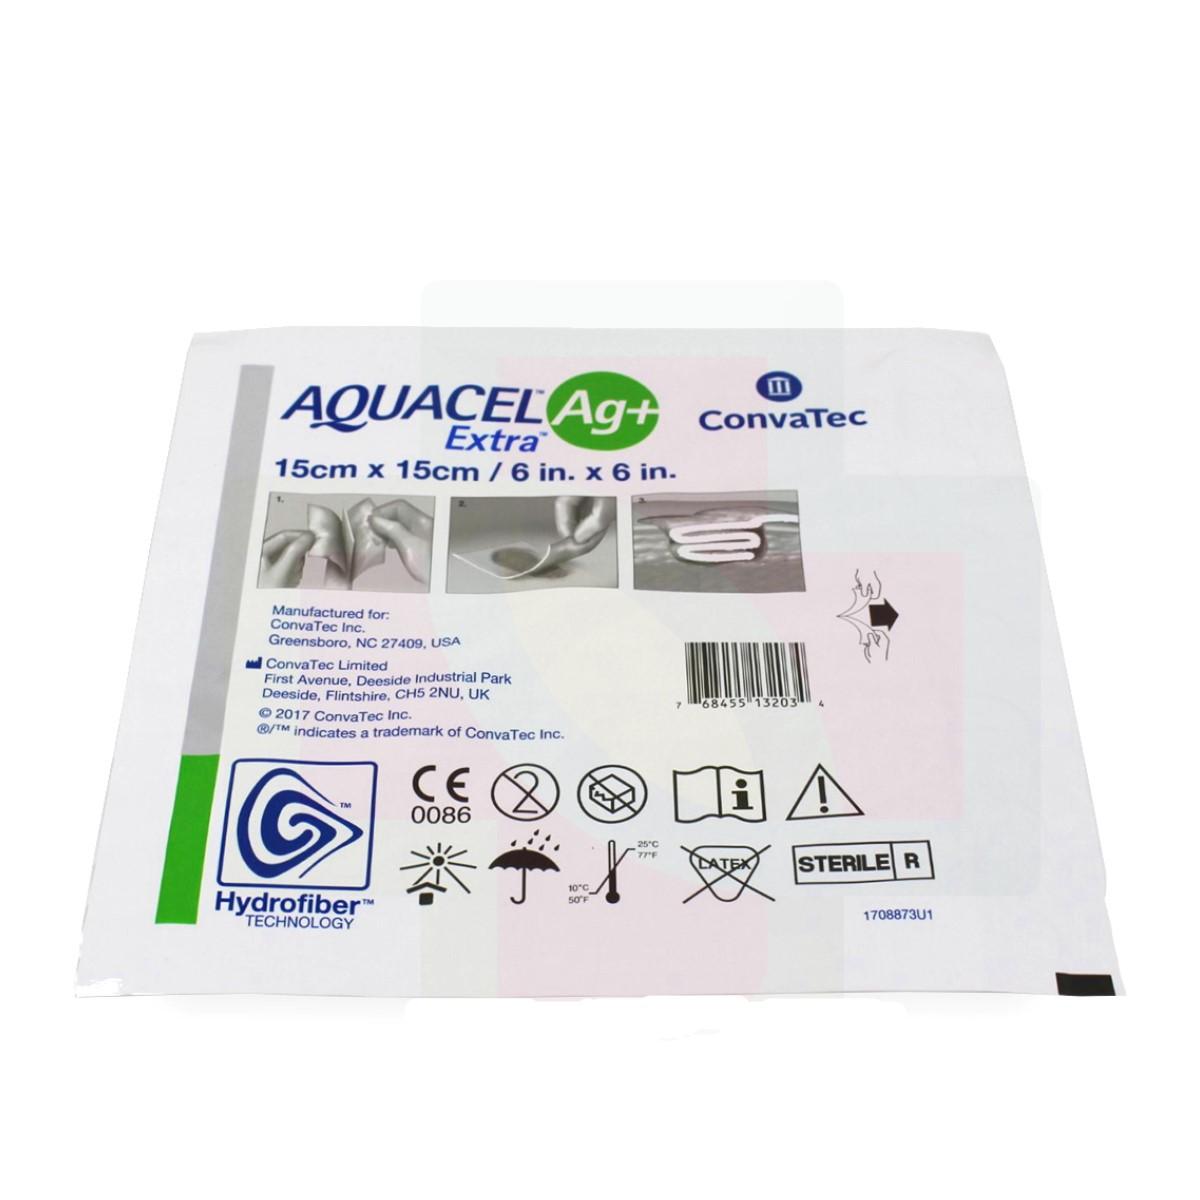 CURATIVO AQUACEL AG+ EXTRA 15 X 15 BR10378 CM UND - CONVATEC